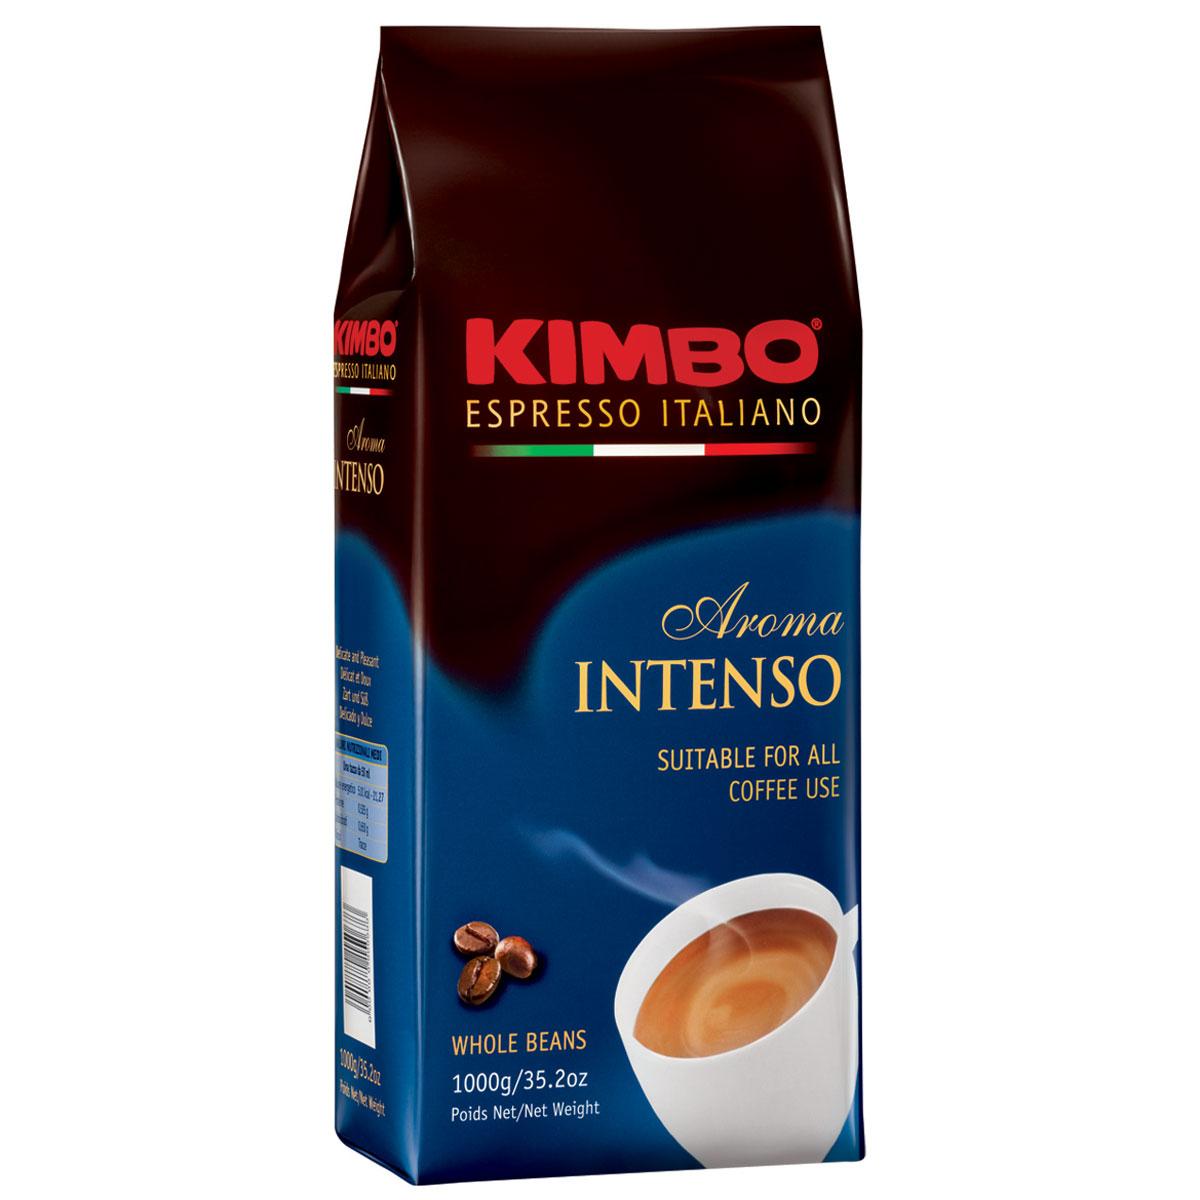 Kimbo Aroma Intenso кофе в зернах, 1 кг pausa aroma bar кофе в зернах 1 кг